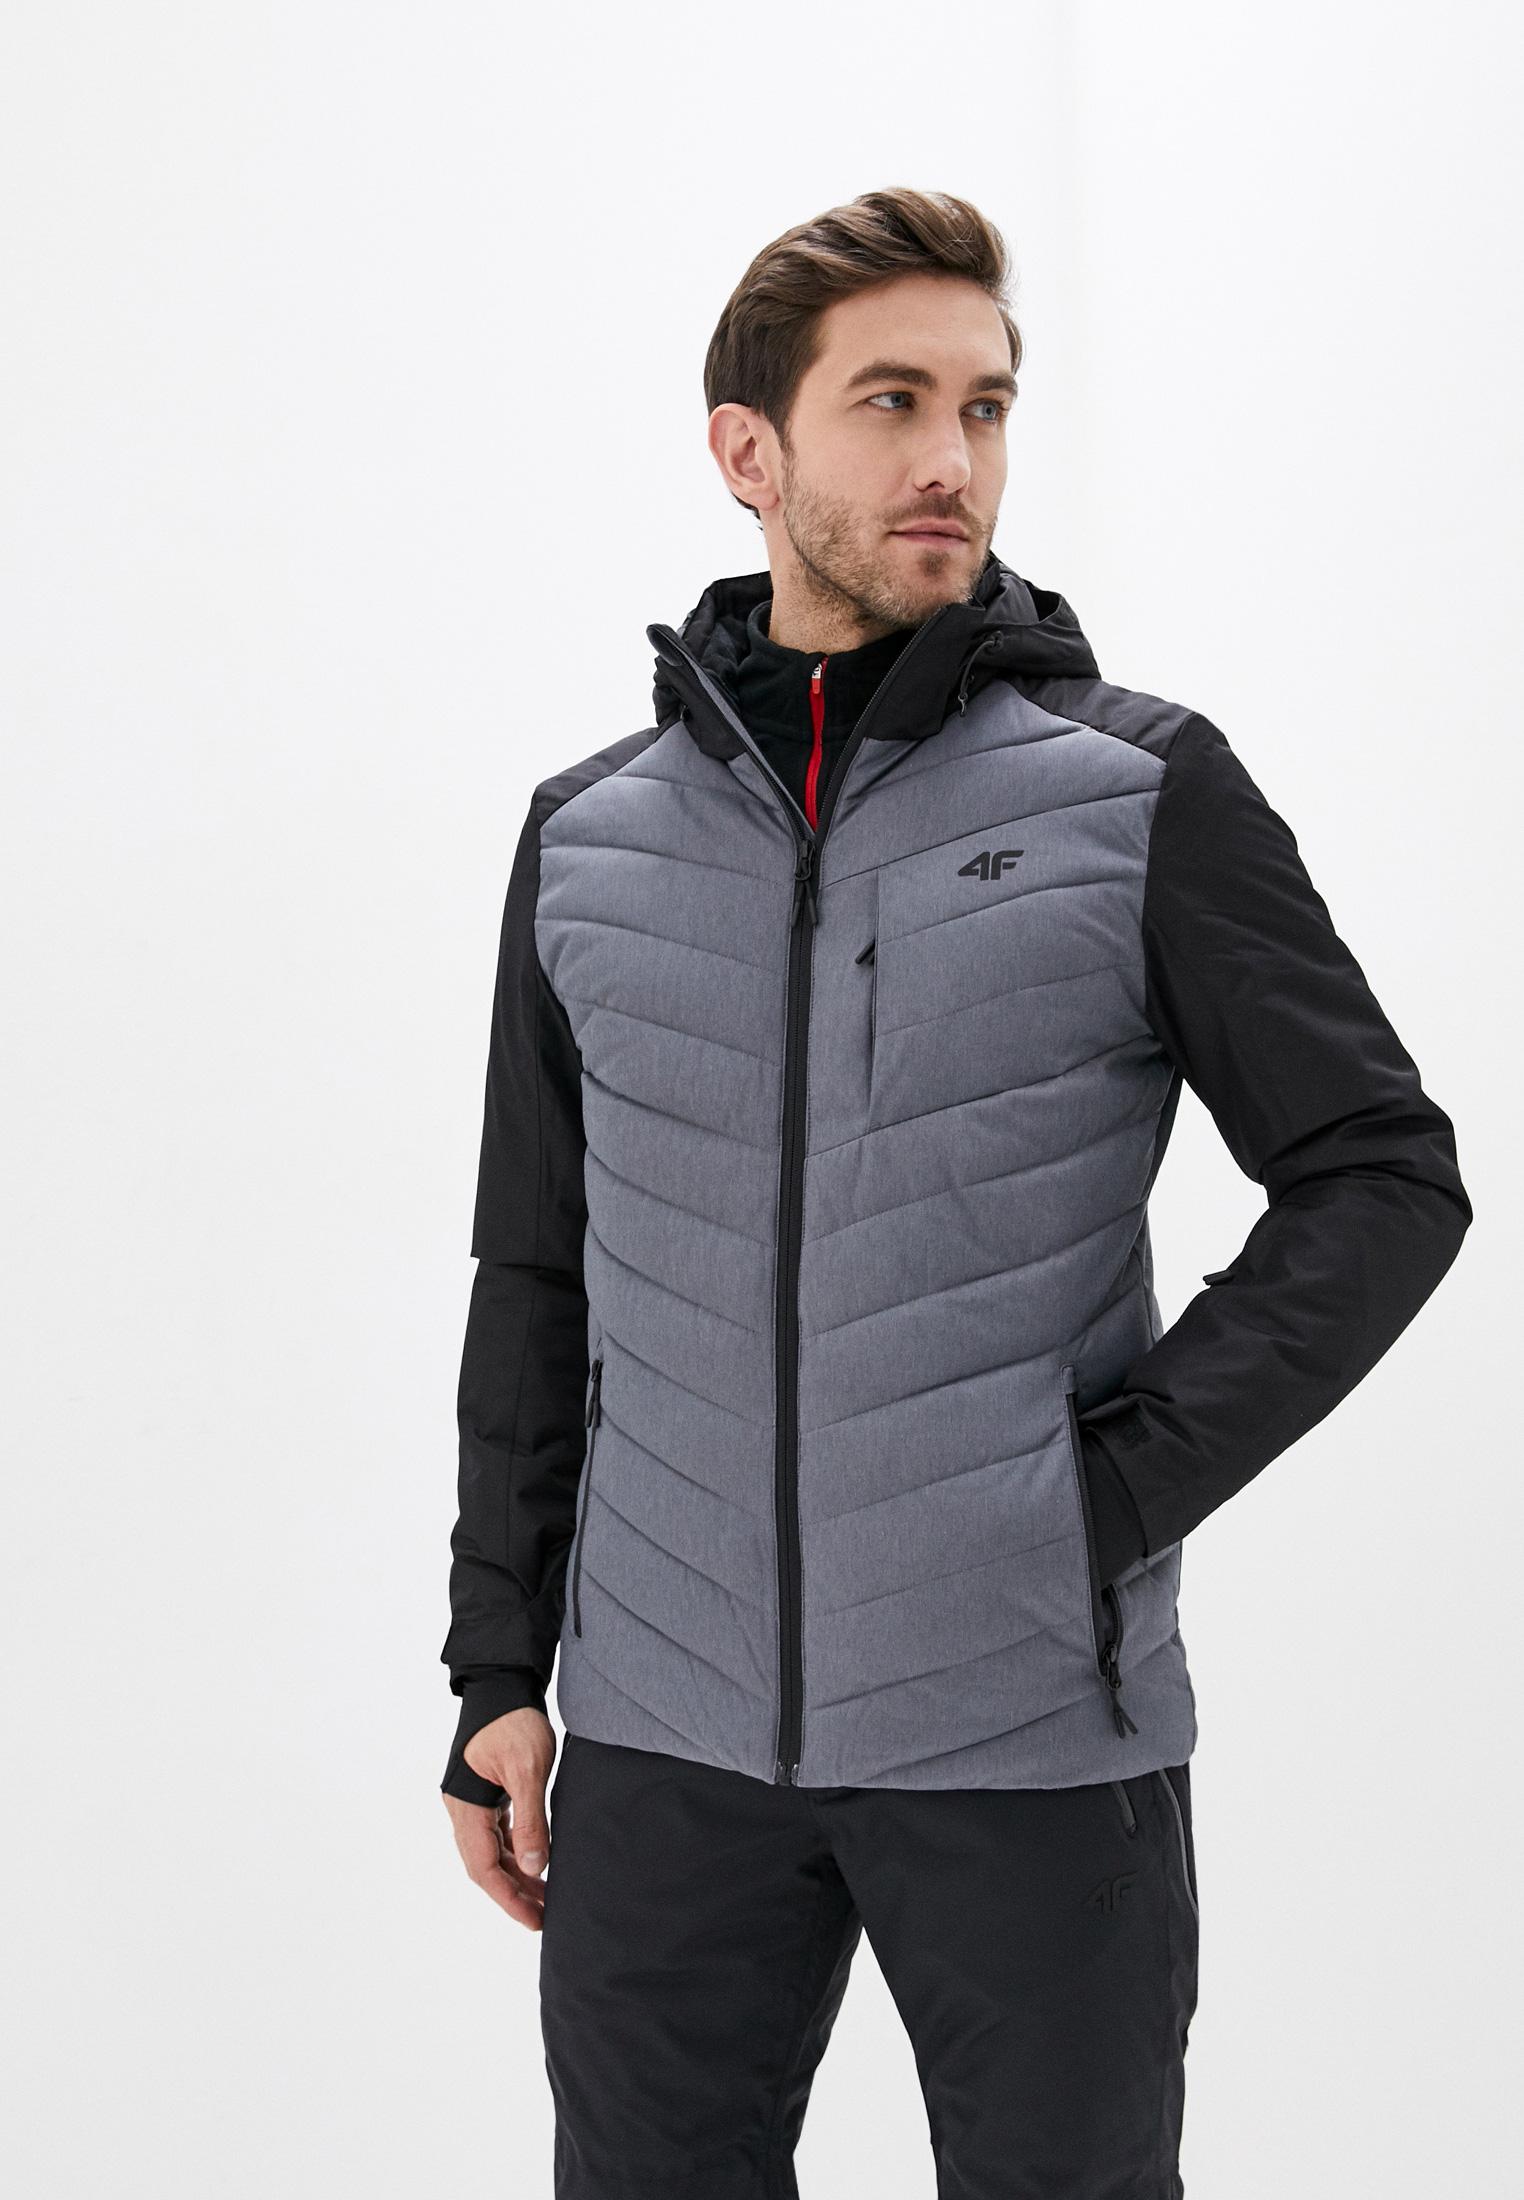 4F Куртка горнолыжная